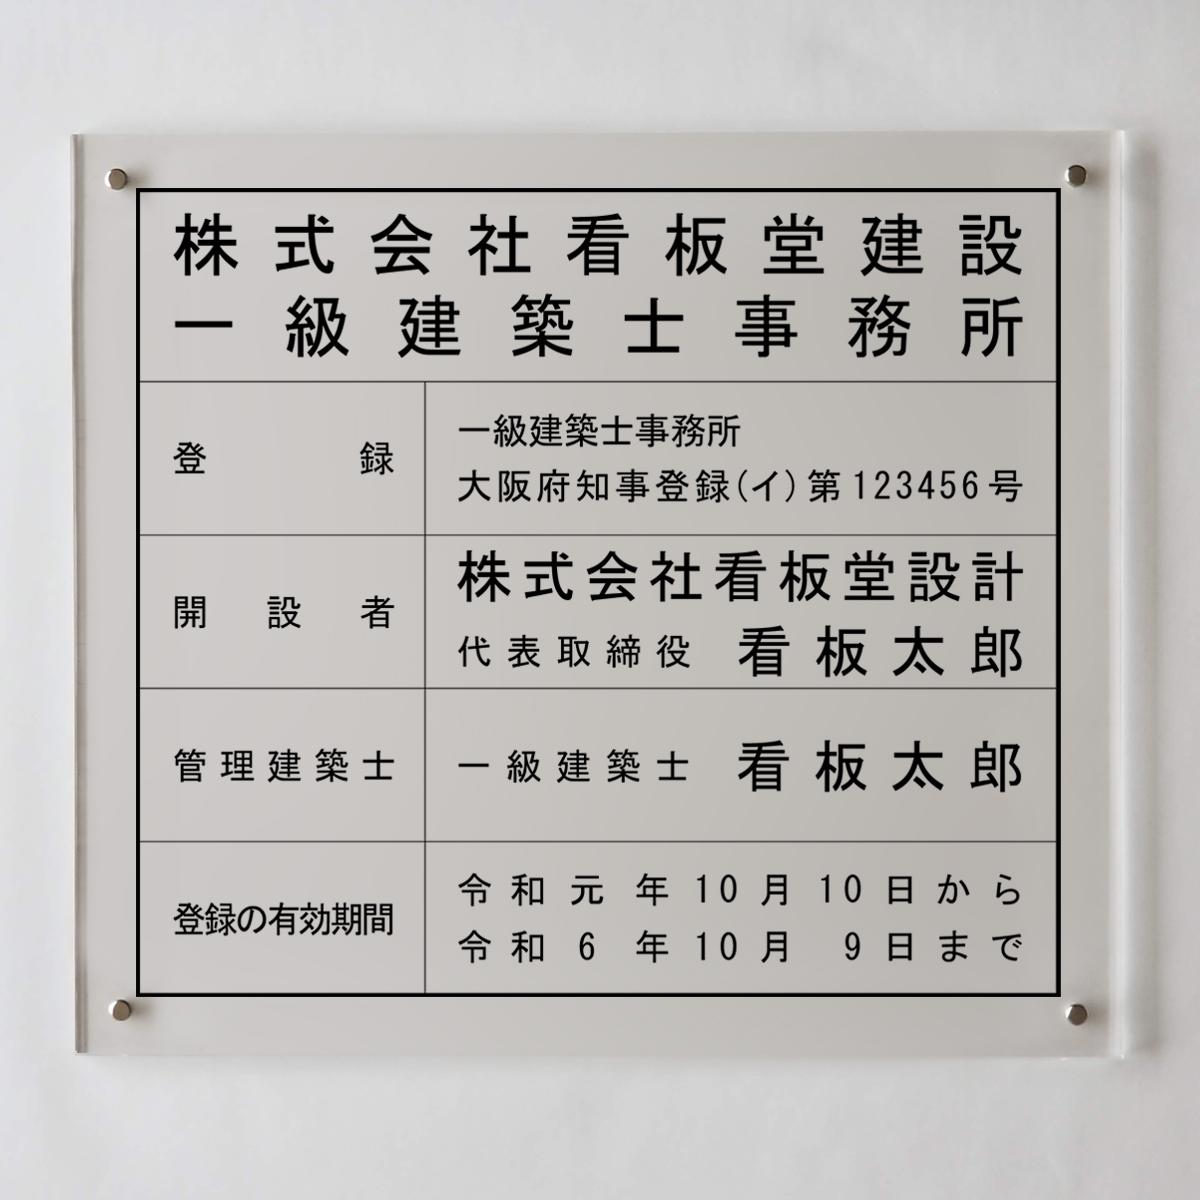 建築士事務所登録票アクリル置き型(自立式)/ 店舗 事務所用看板 文字入れ 名入れ 別注品 特注品 看板 法定看板 許可票 建設業の許可票